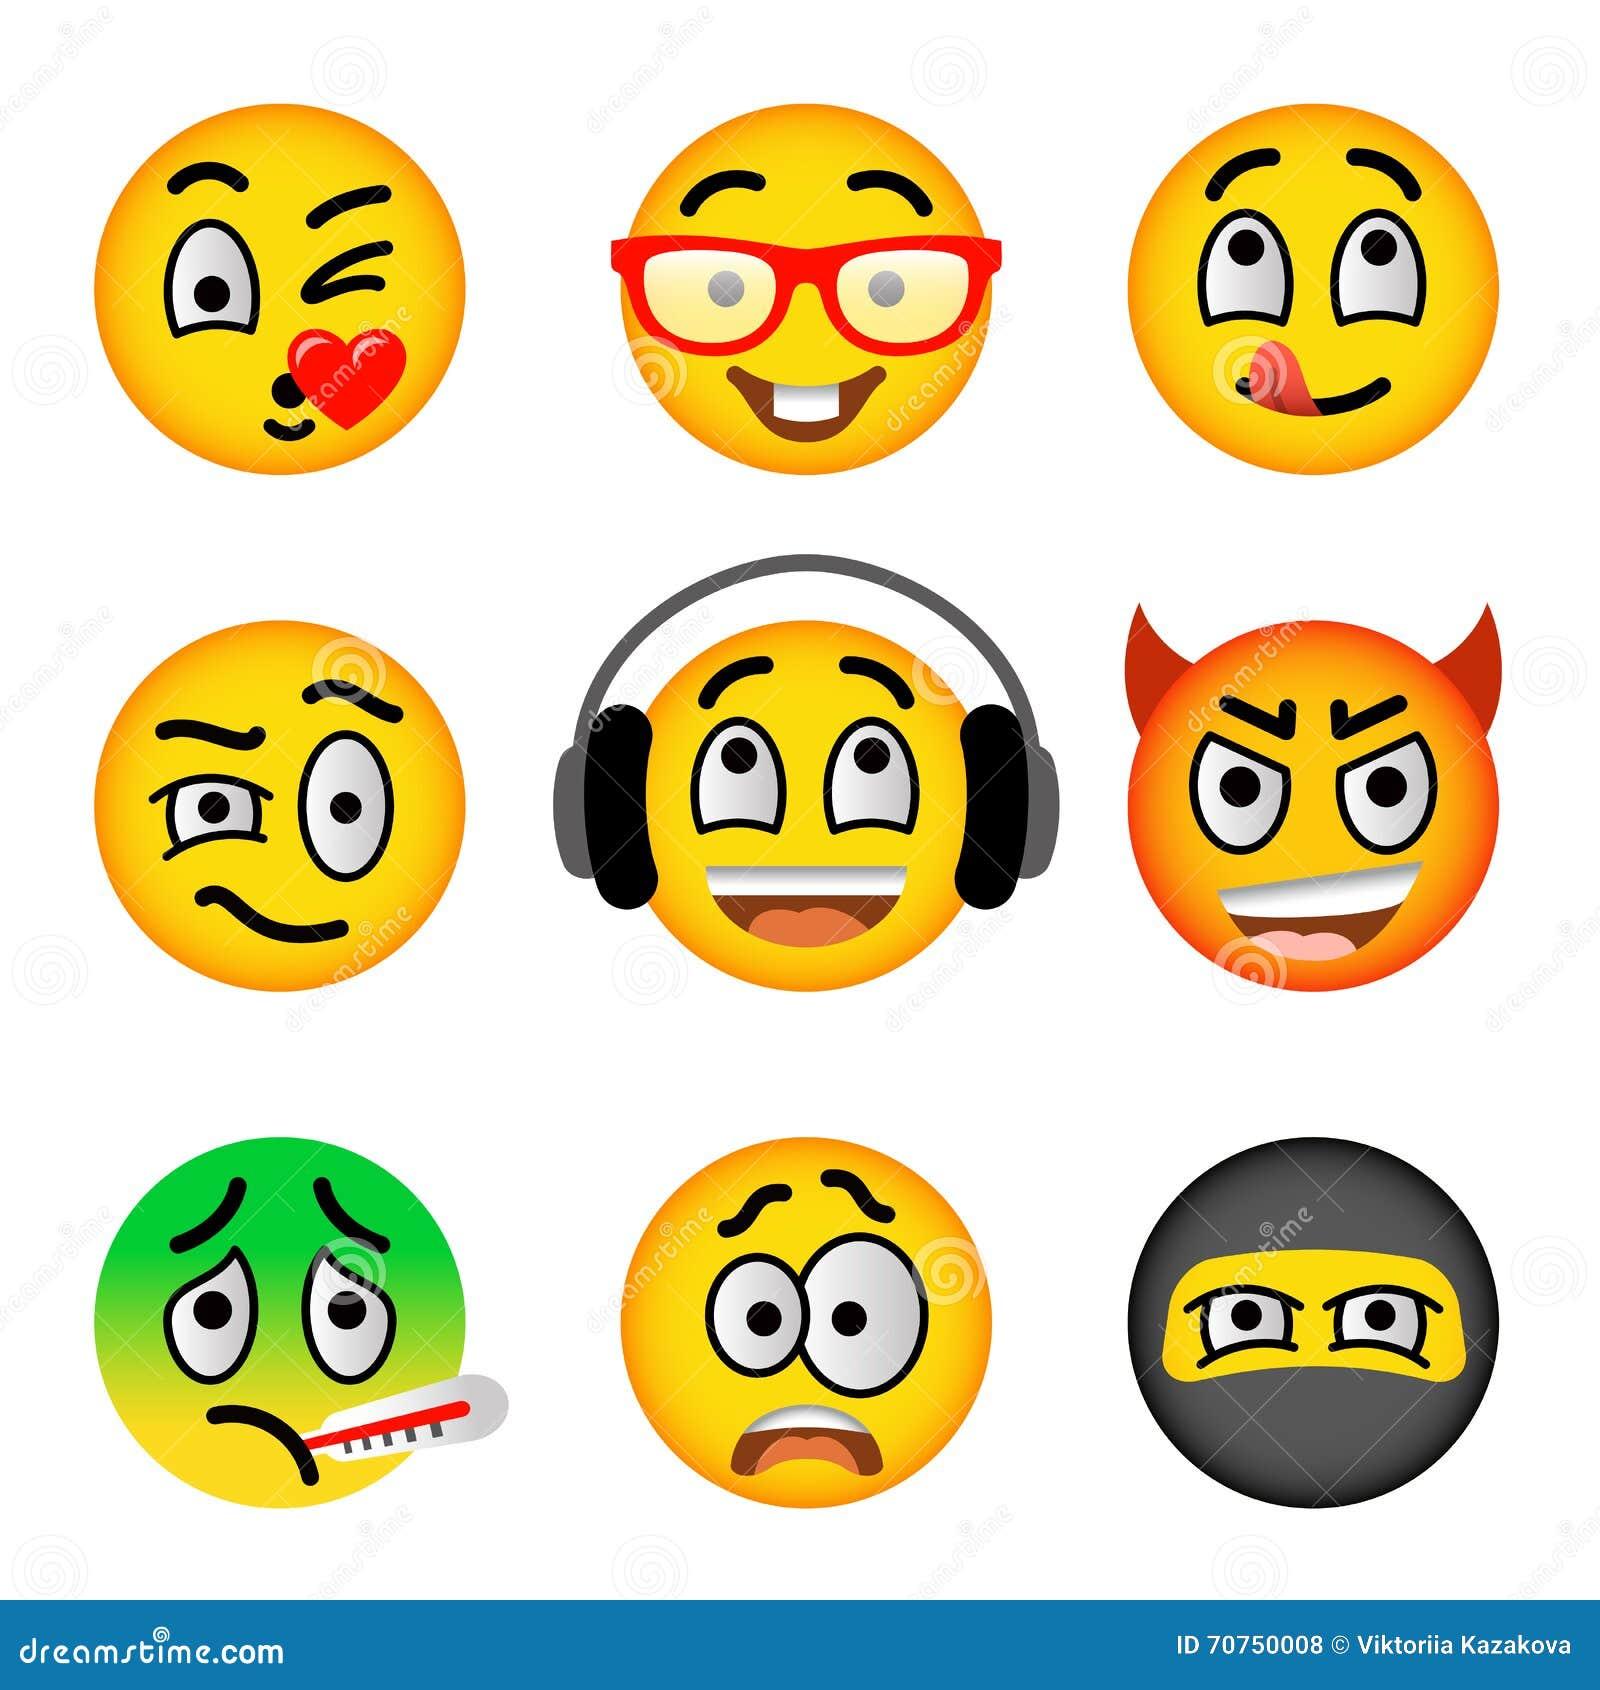 Smiley Face Emoji Flat Vector Icons Set Stock Vector Illustration